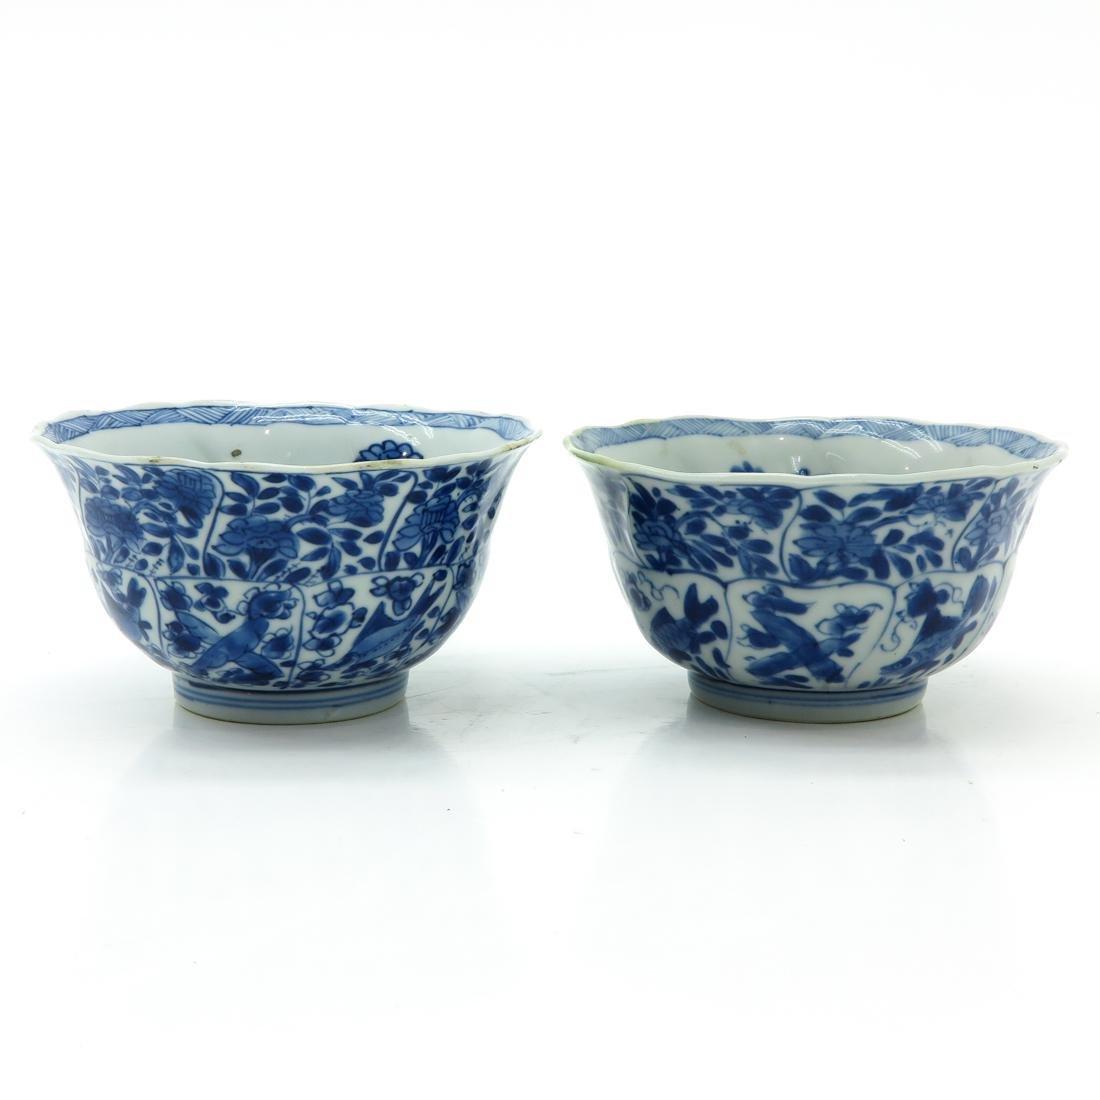 Lot of 2 Bowls - 2